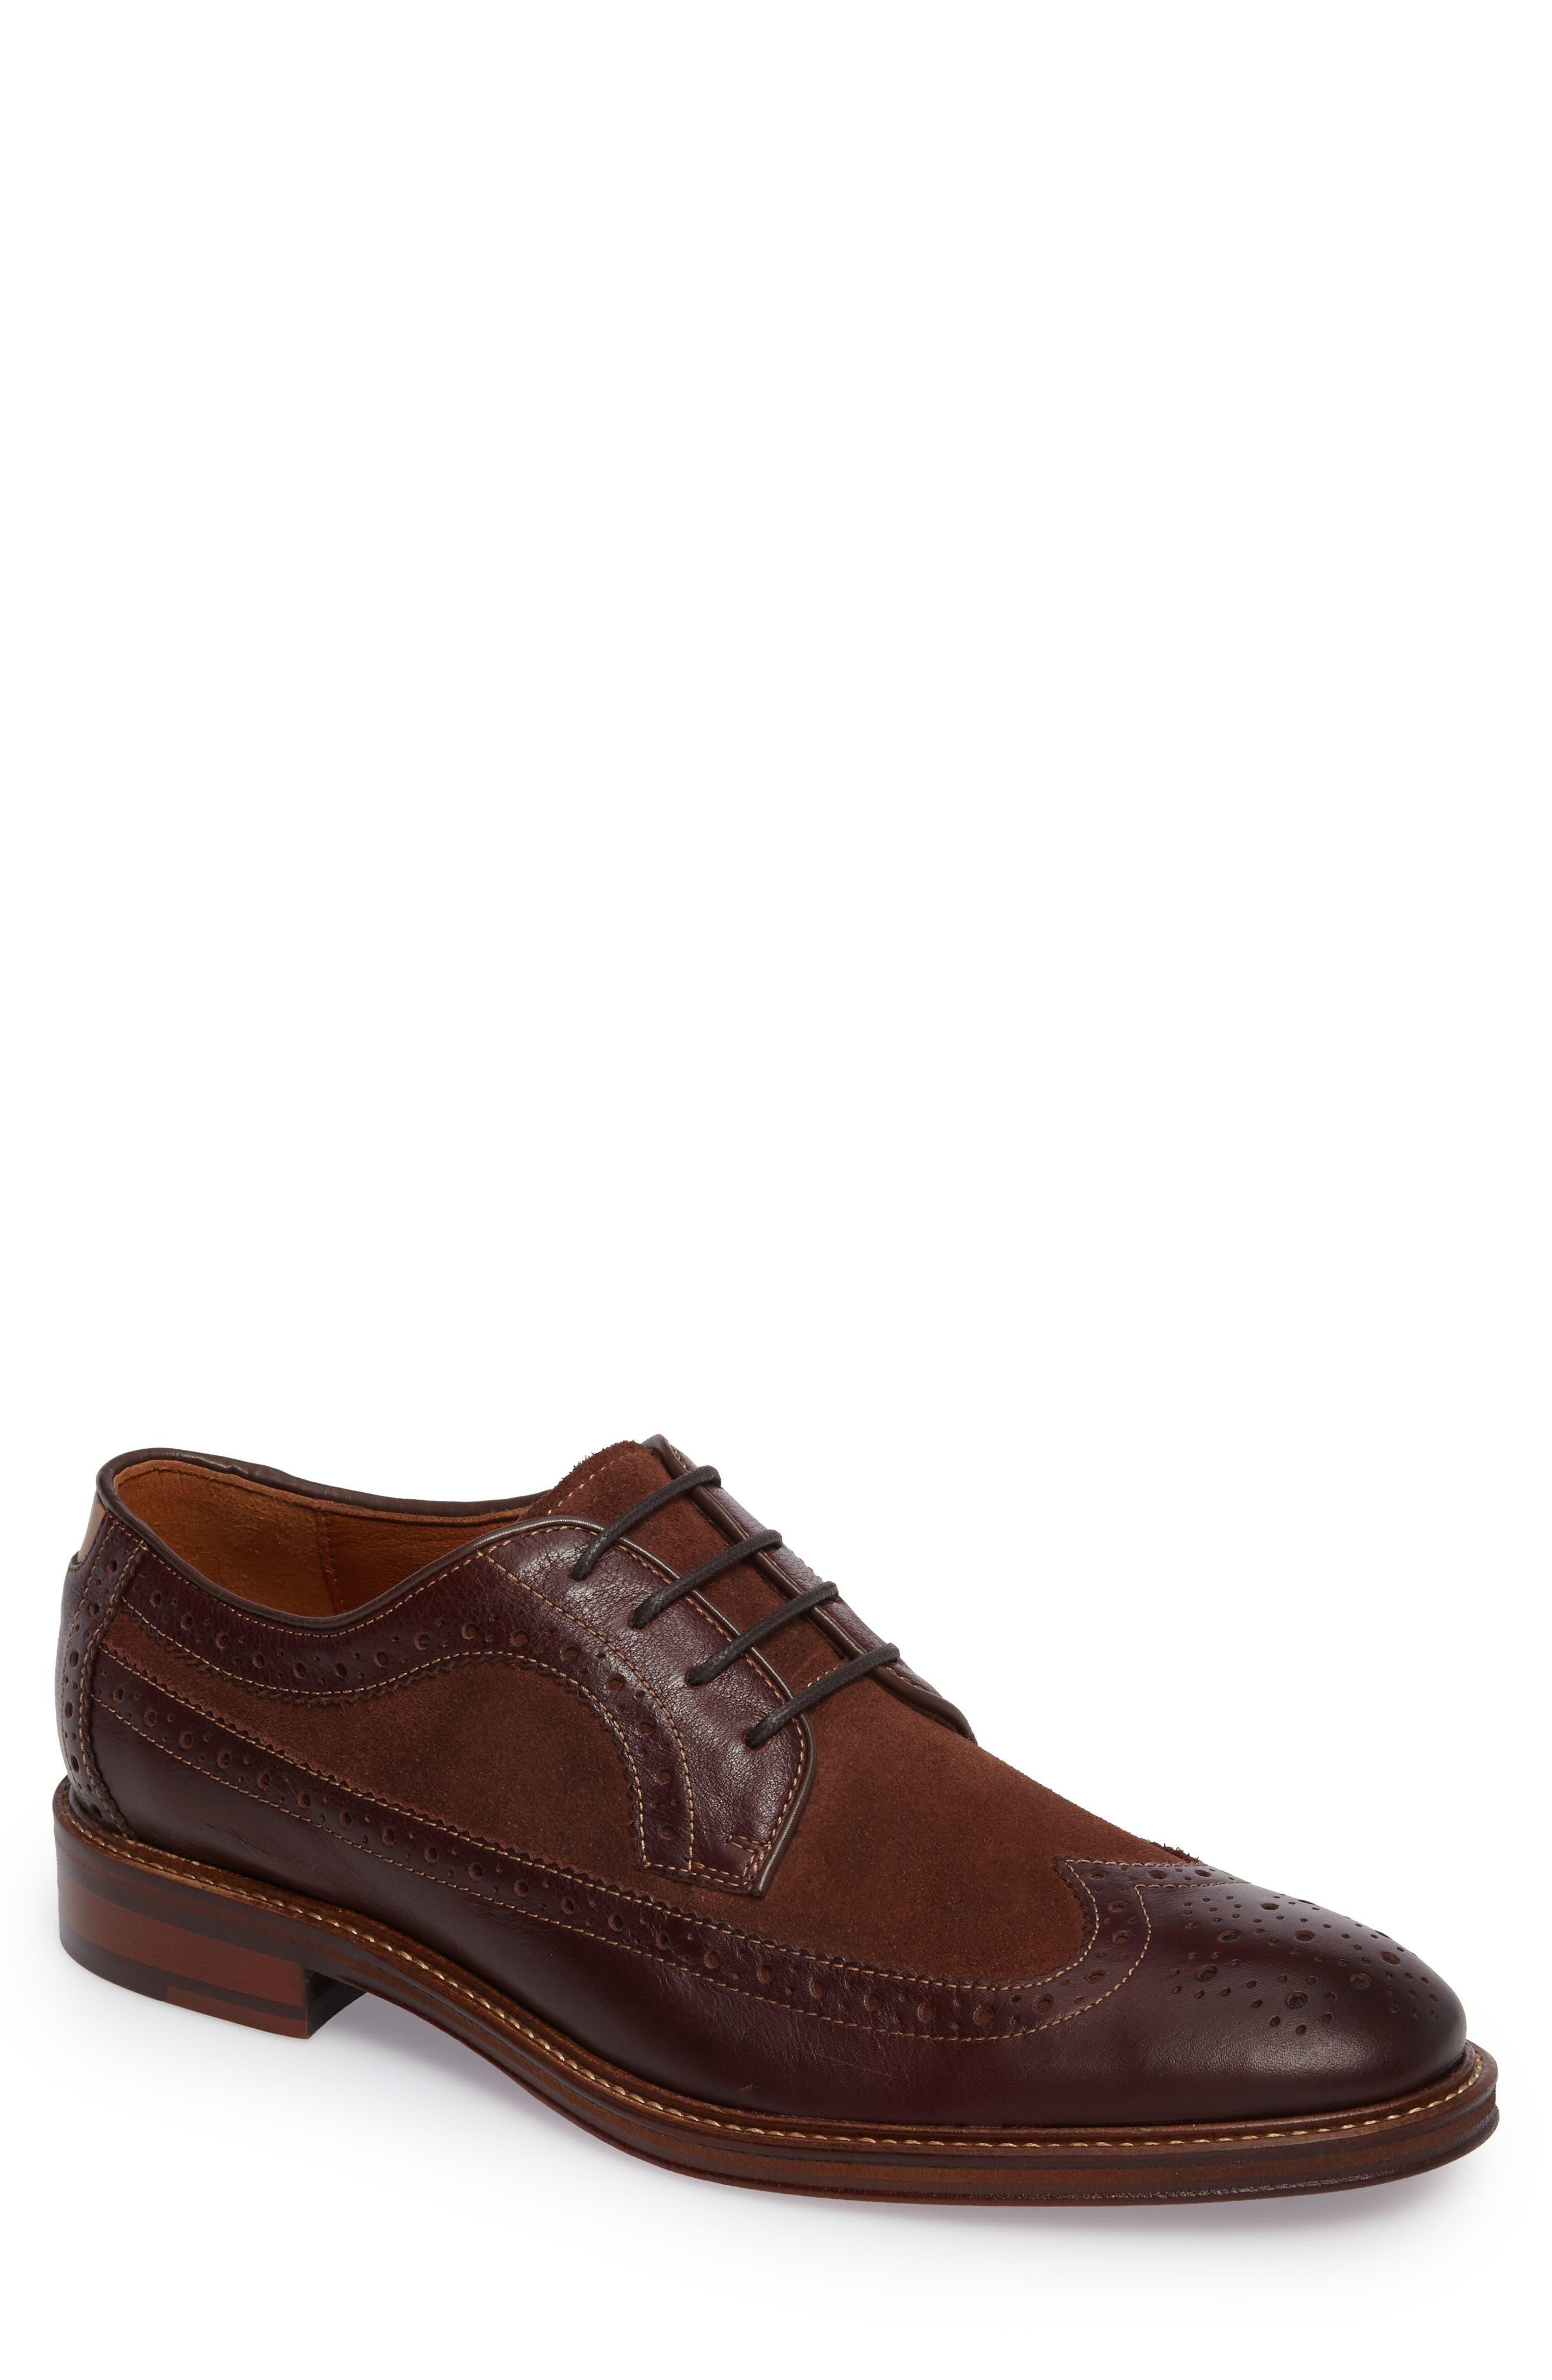 Alternate Image 1 Selected - Johnston & Murphy Warner Spectator Shoe (Men)